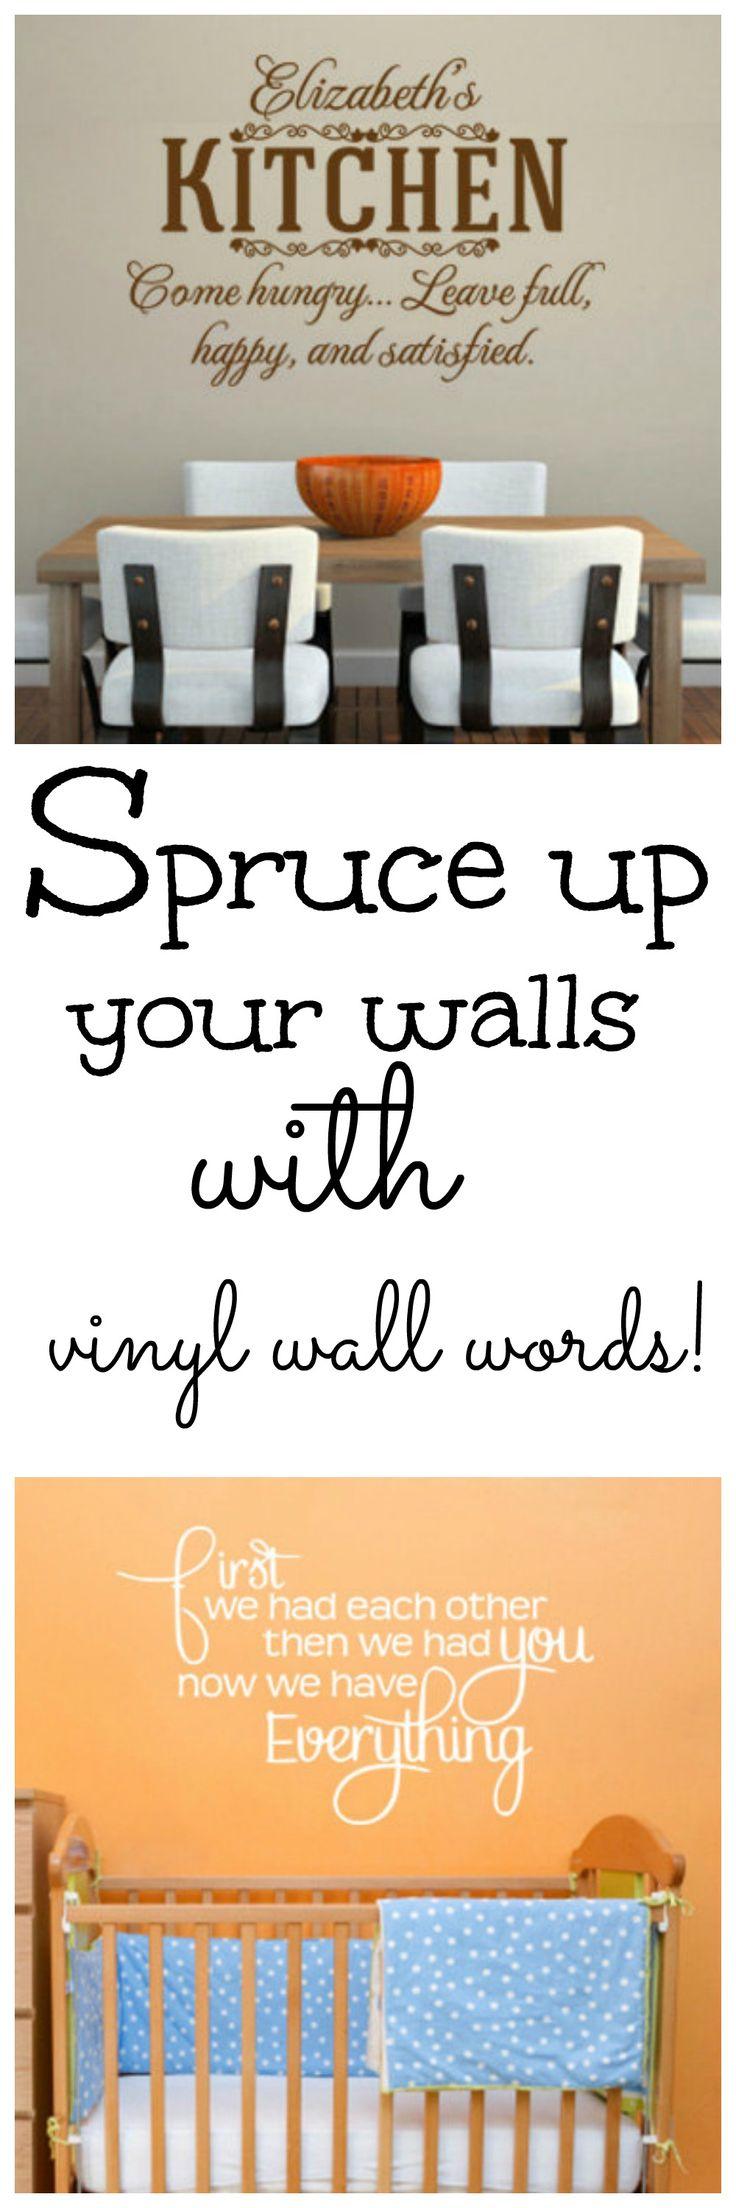 Baby scrapbook ideas quotes - Vinyl Wall Words And Quotes Of Inspiration Giveaway Baby Scrapbook Pageswall